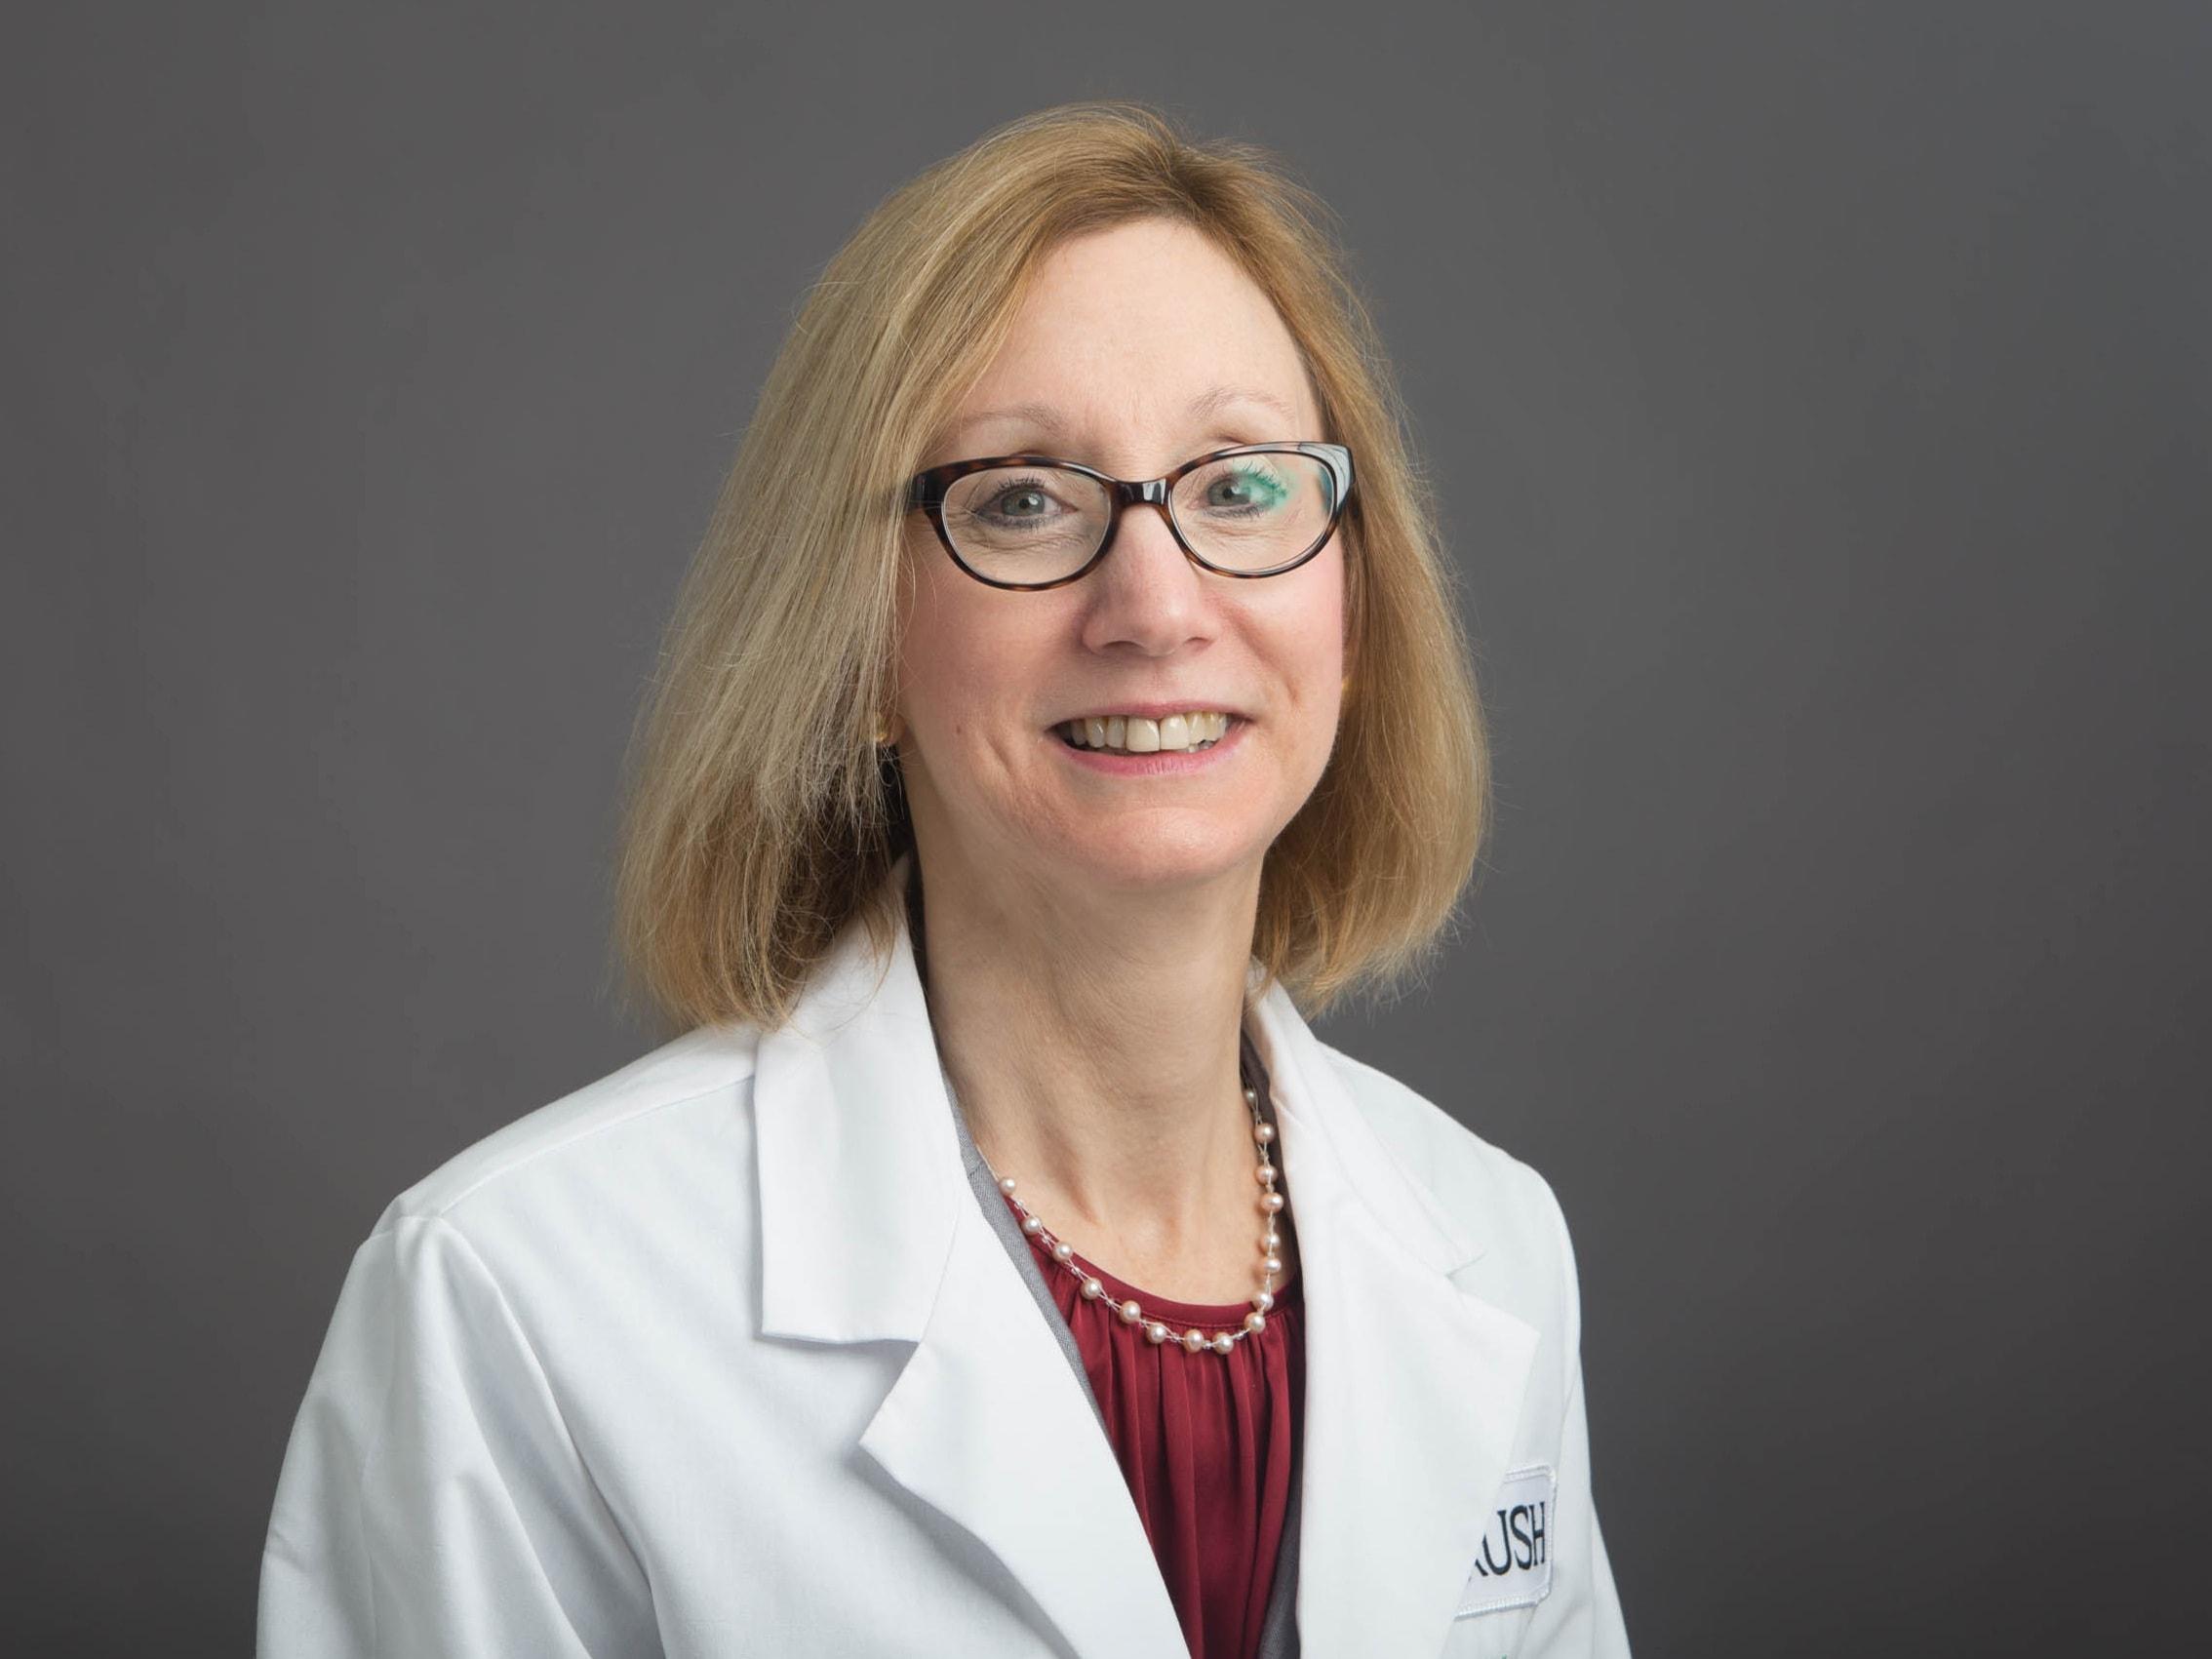 Patricia Graham, MD, FACP